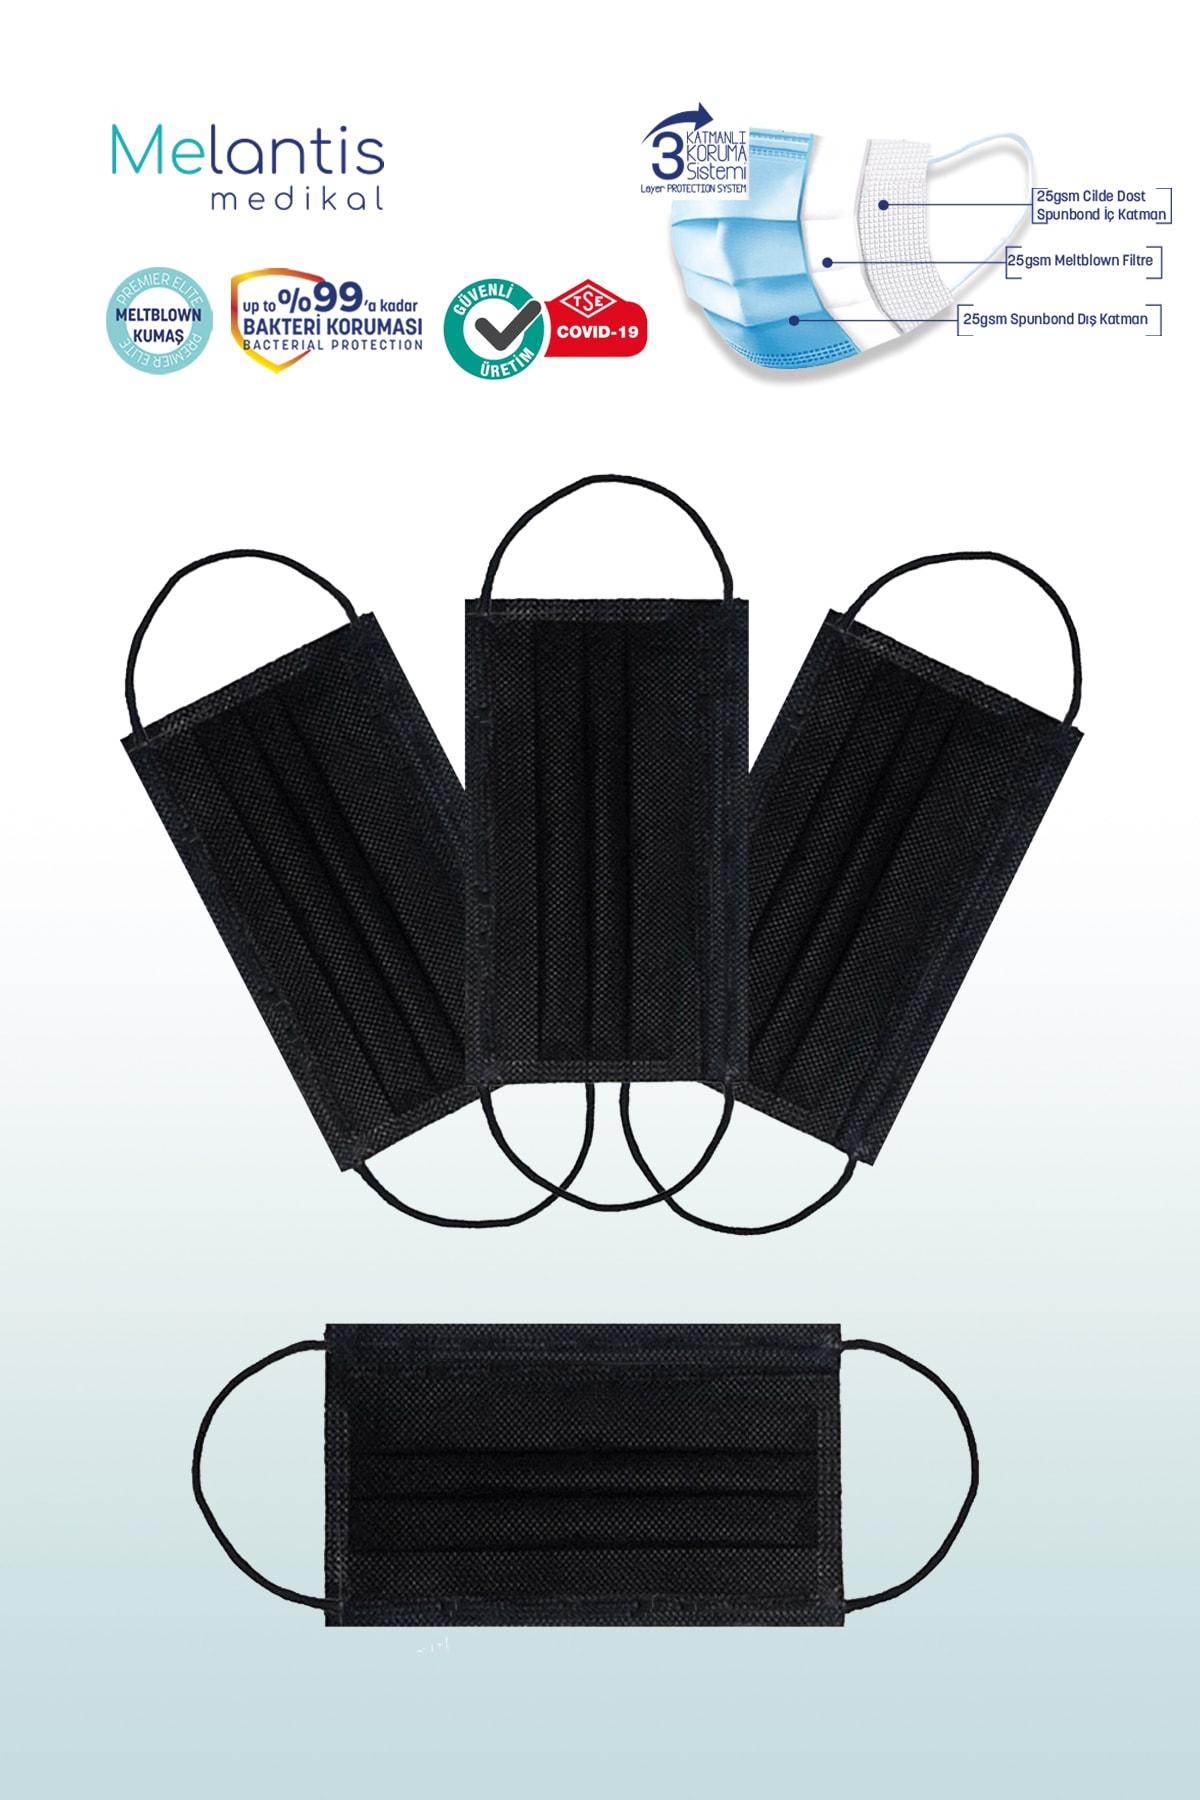 Melantis Medikal Tek Kullanımlık 3 Katlı Telli Cerrahi Maske 50 Adet X 2 Kutu Siyah 2